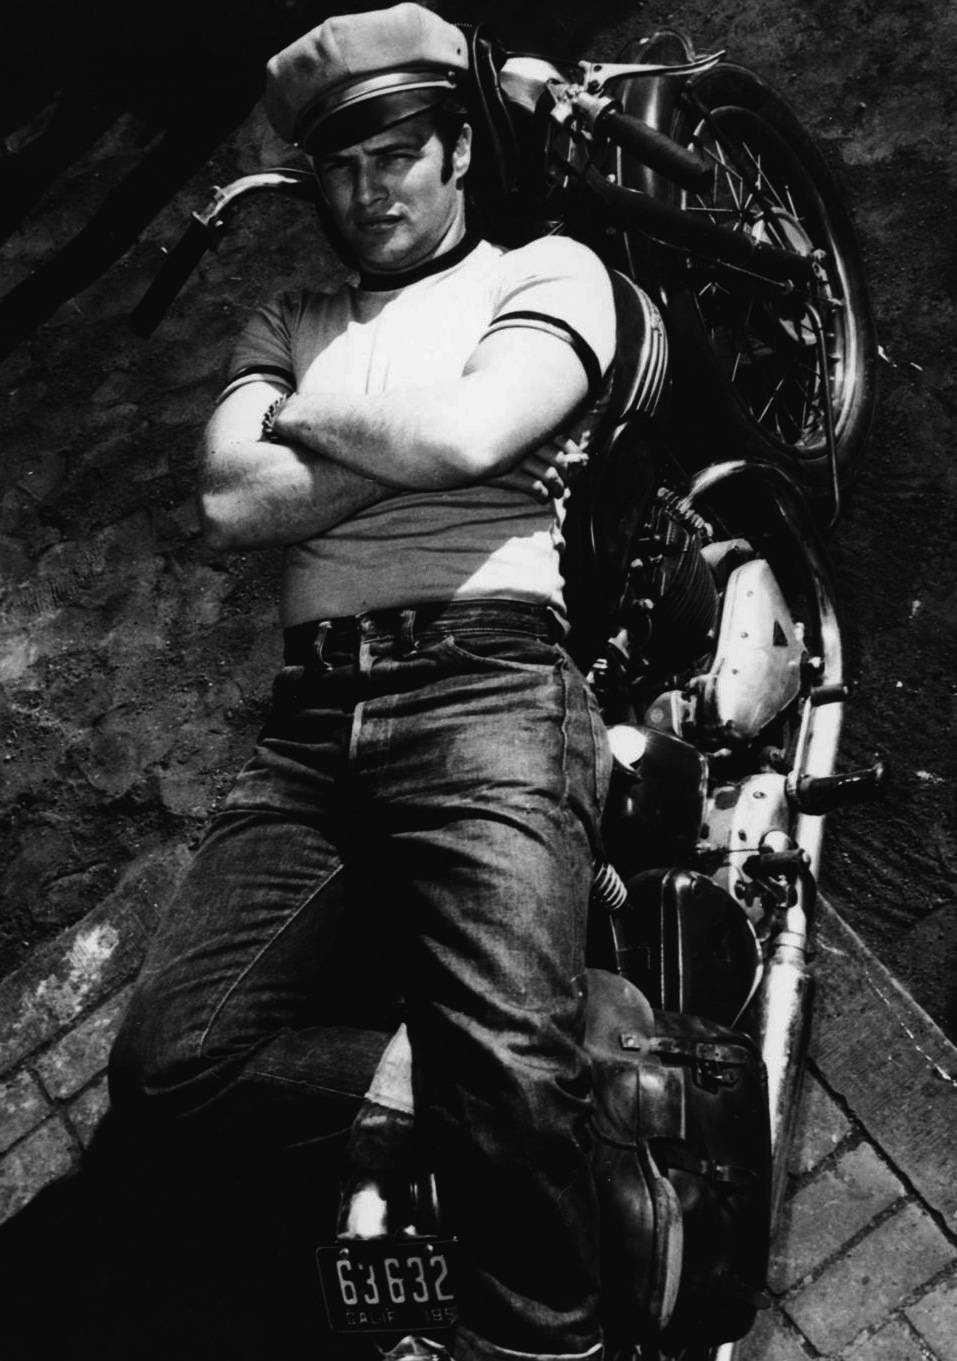 Marlon-Brando-The-Wild-One1